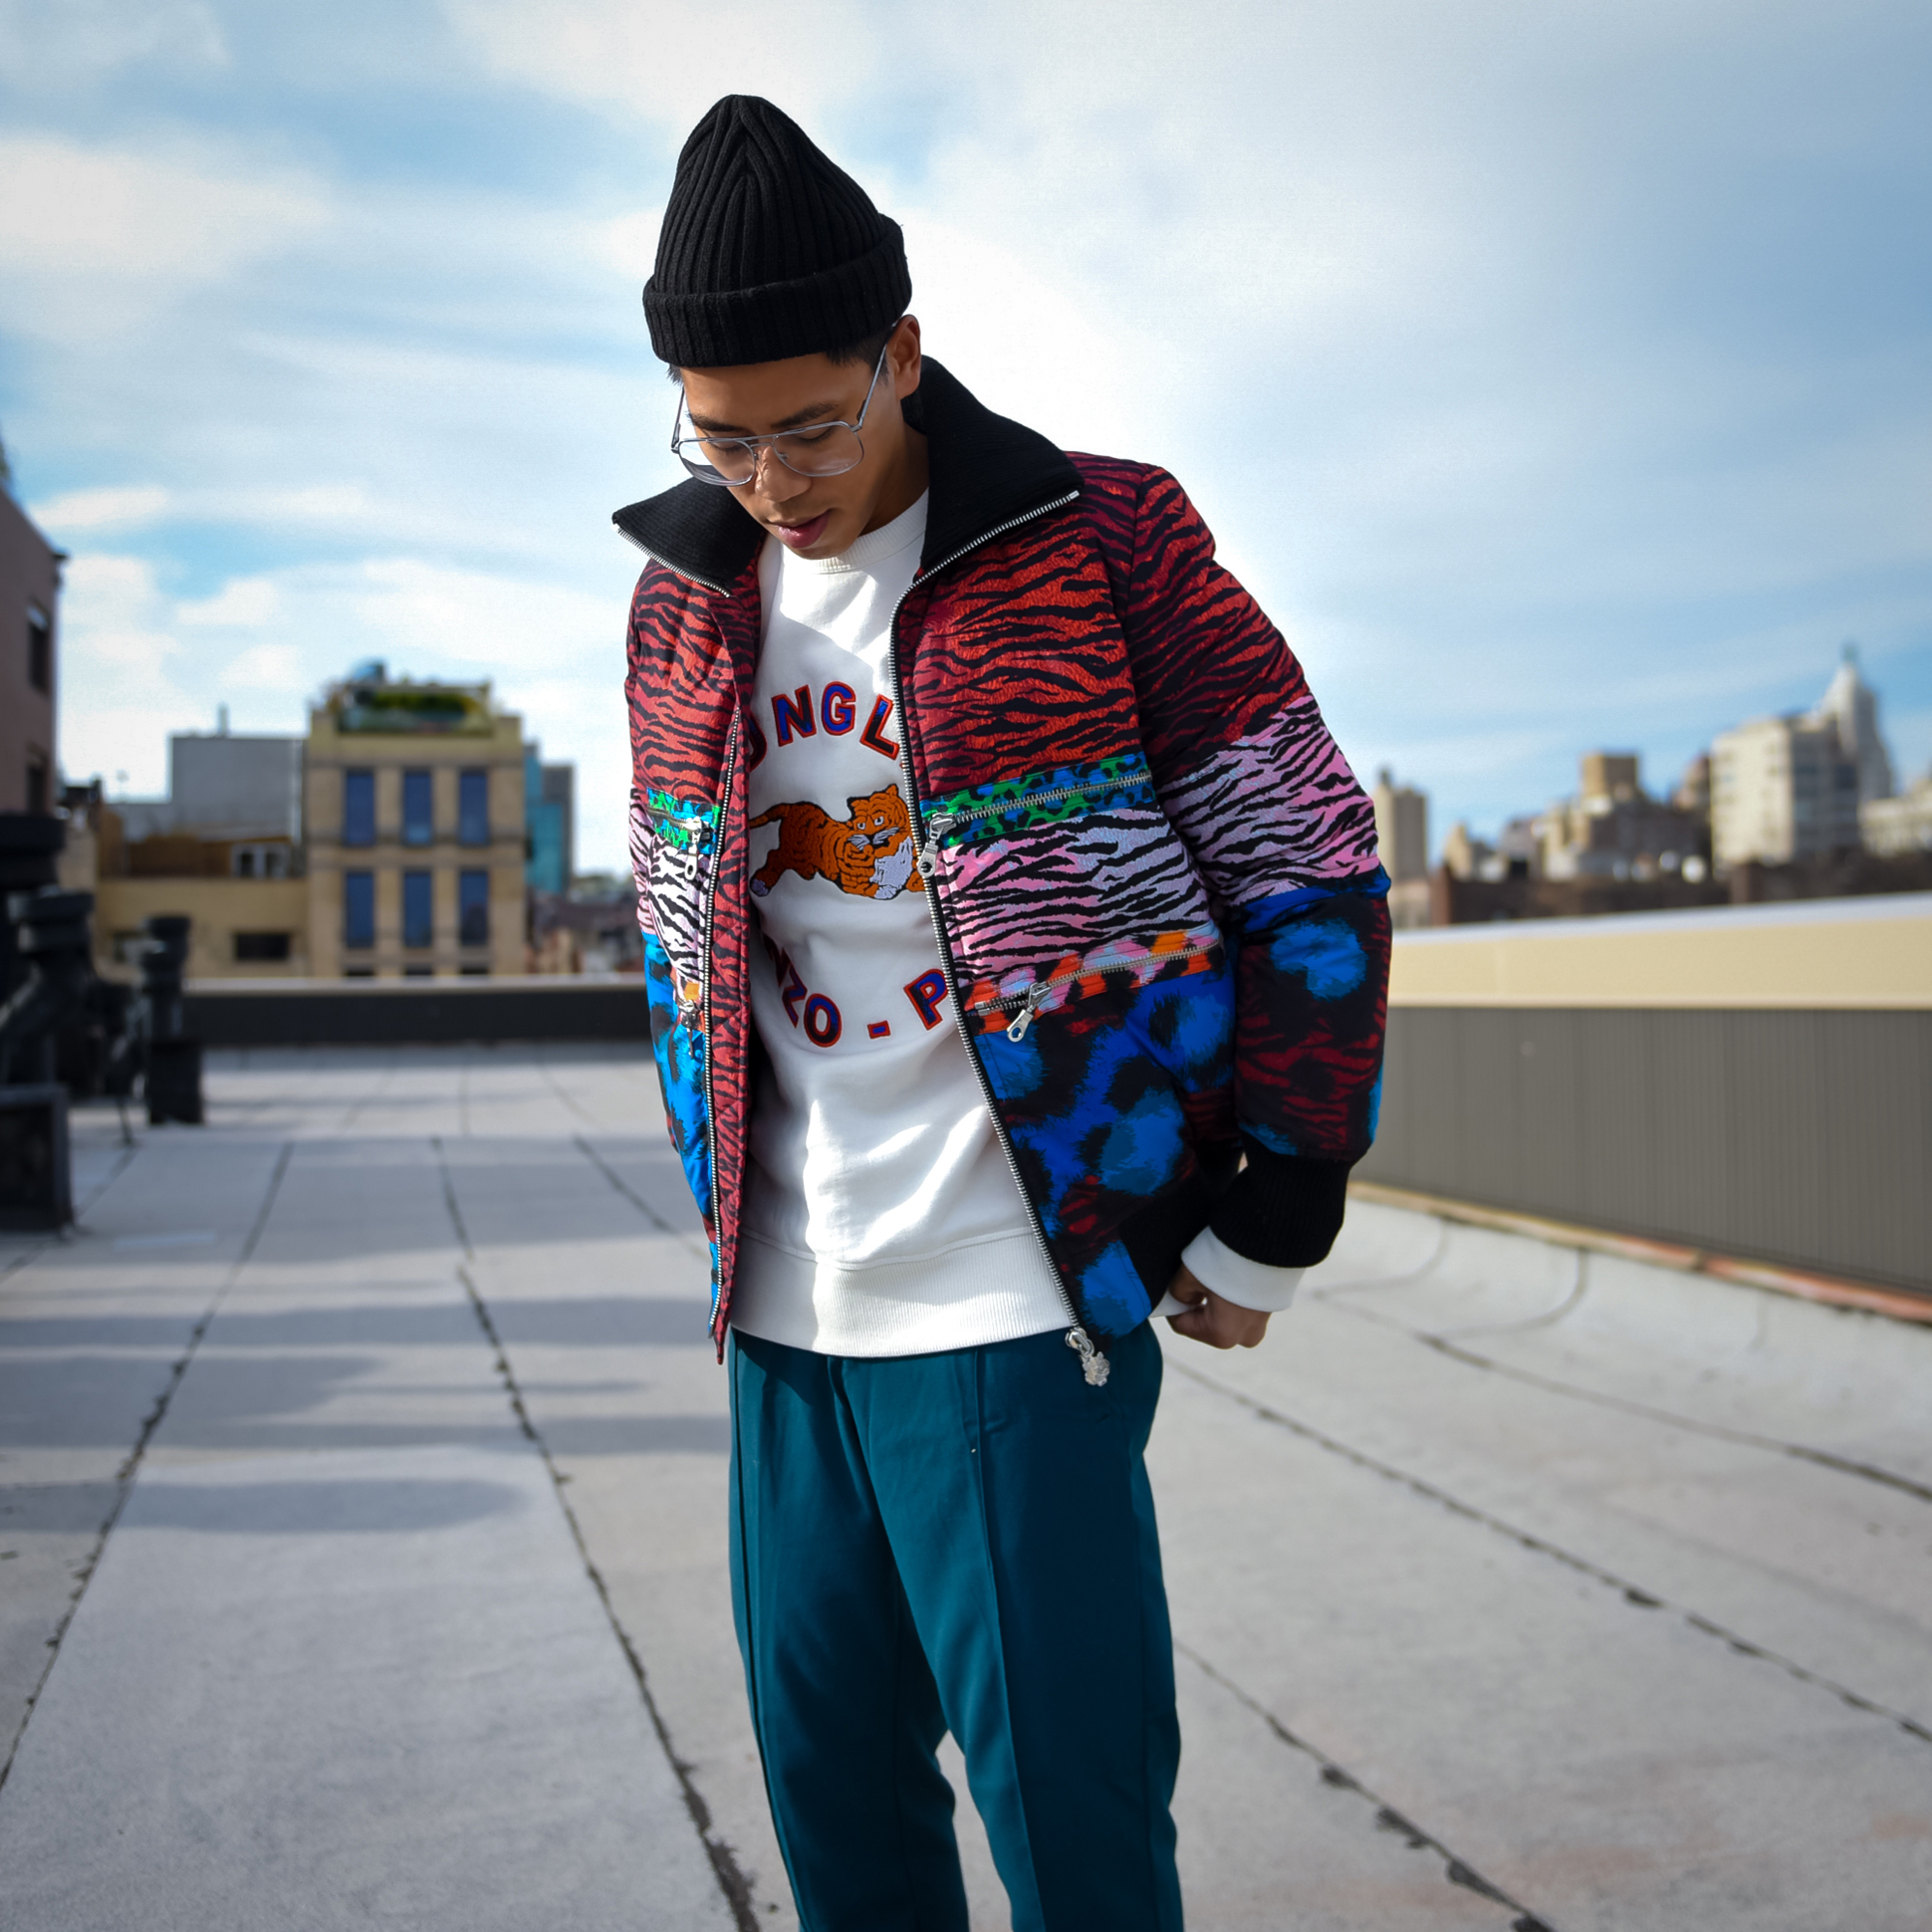 kenzo x hm mens street style lookbook blooger